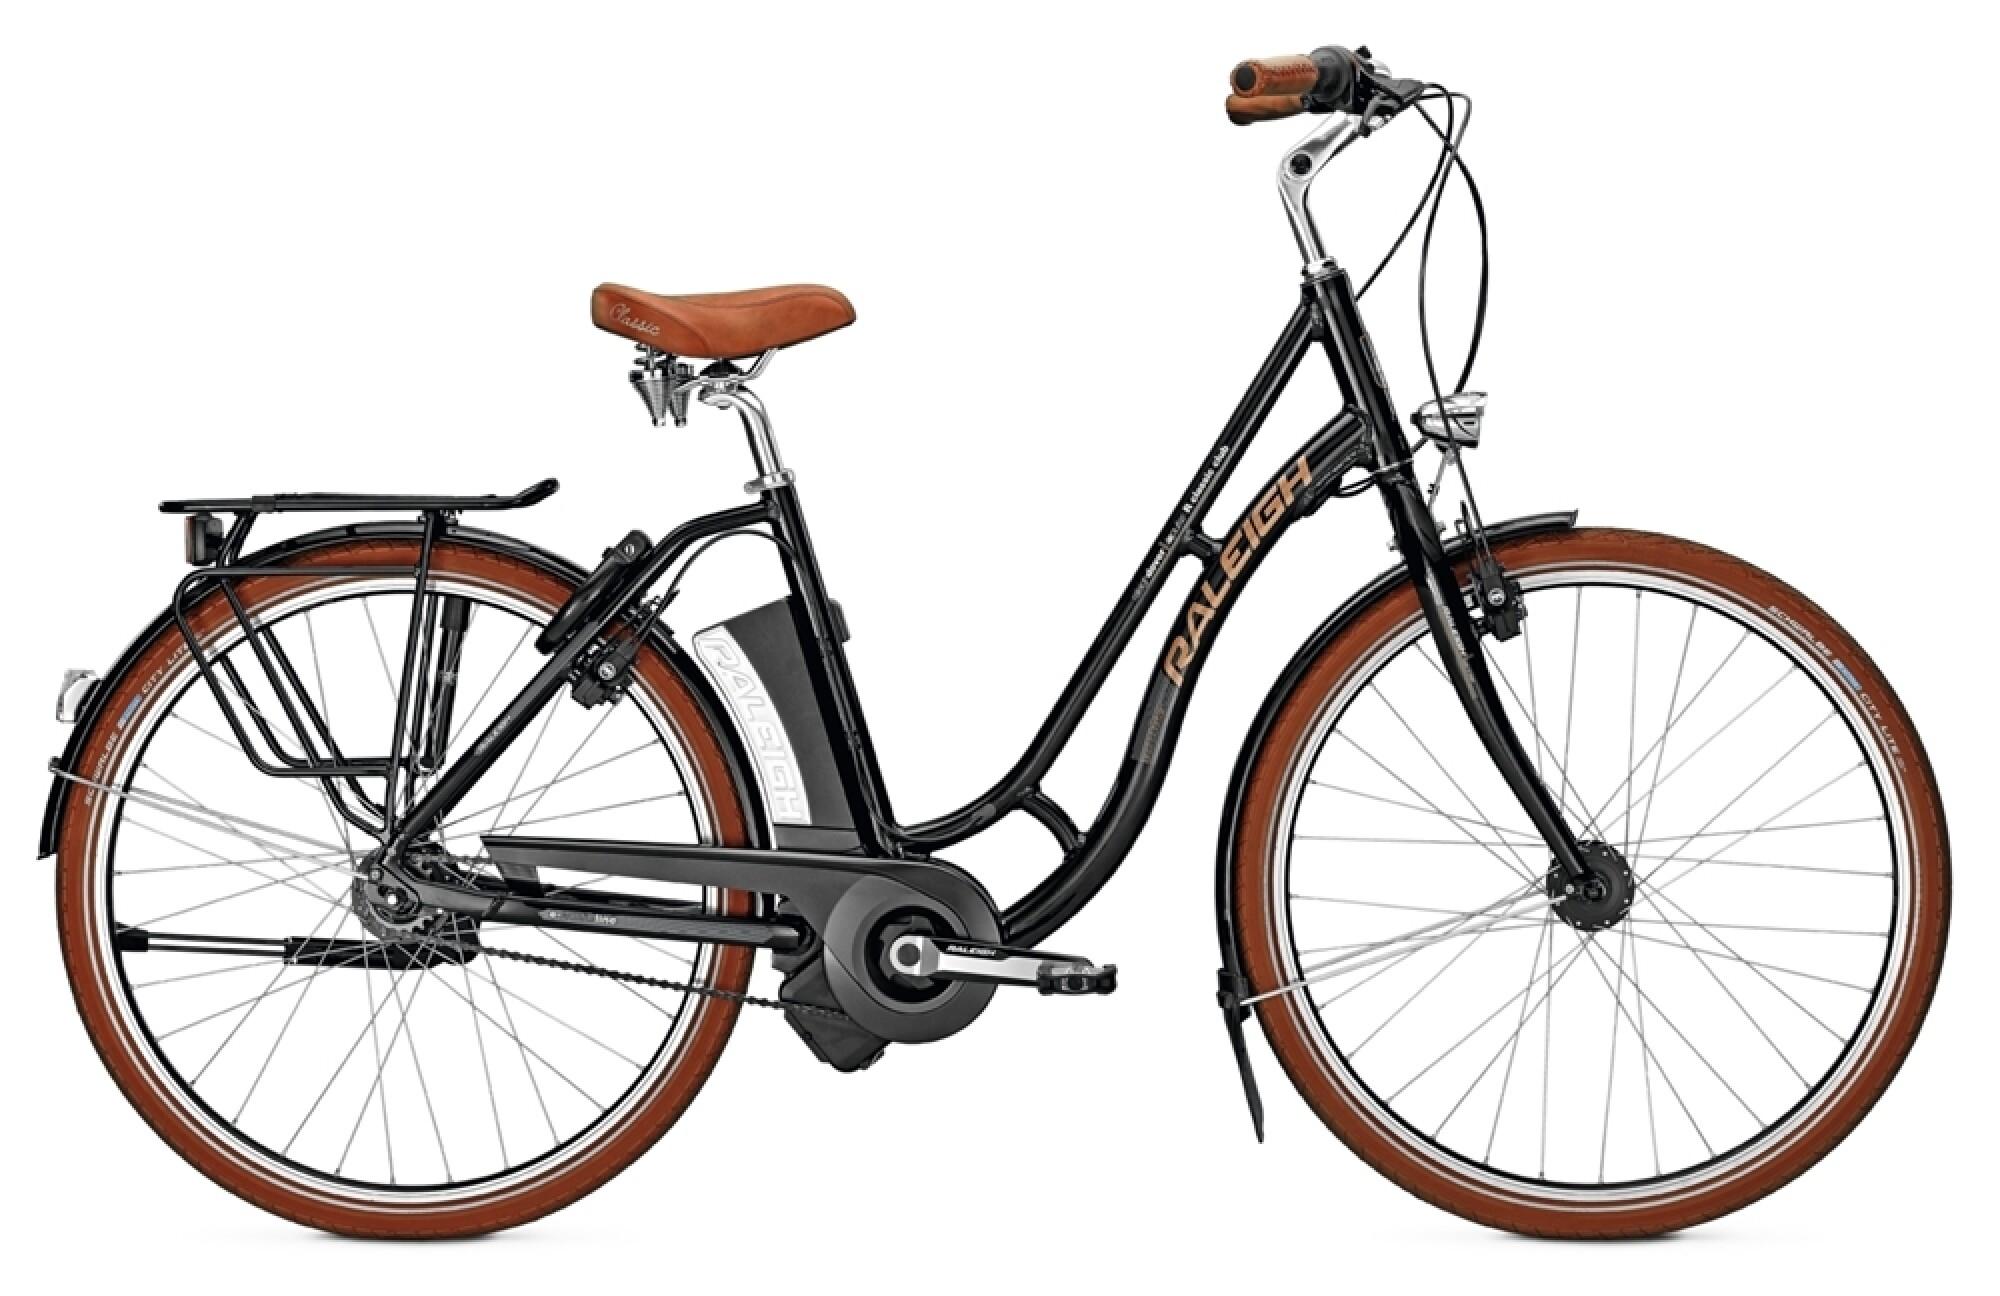 e bike raleigh dover impulse classic club 2017 bei onbikex. Black Bedroom Furniture Sets. Home Design Ideas